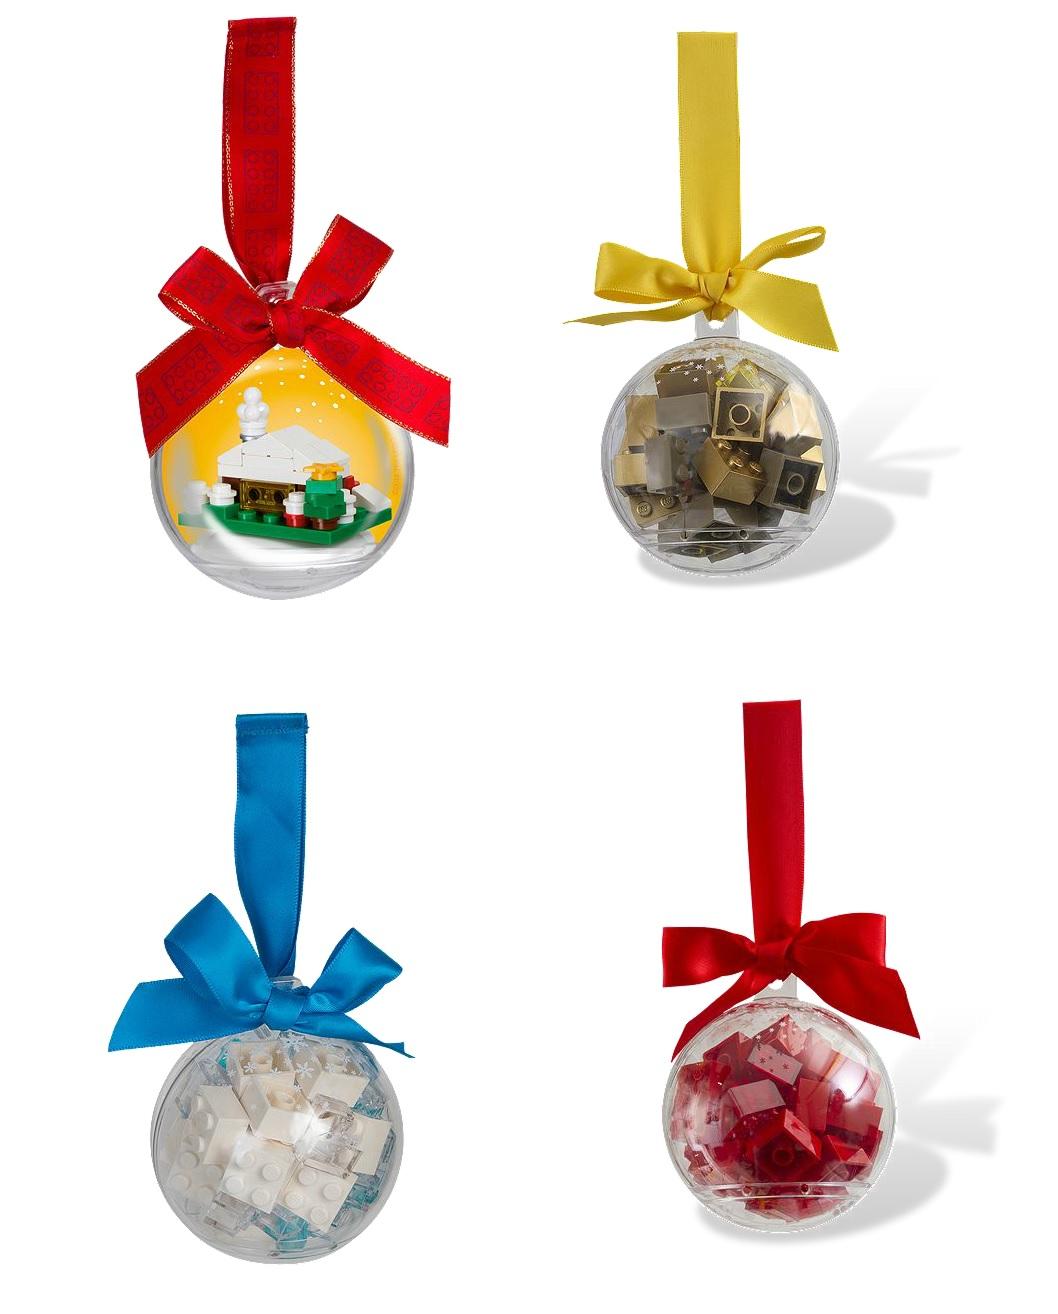 28 Best - Legoland Christmas Ornament - diy lego holidays ...